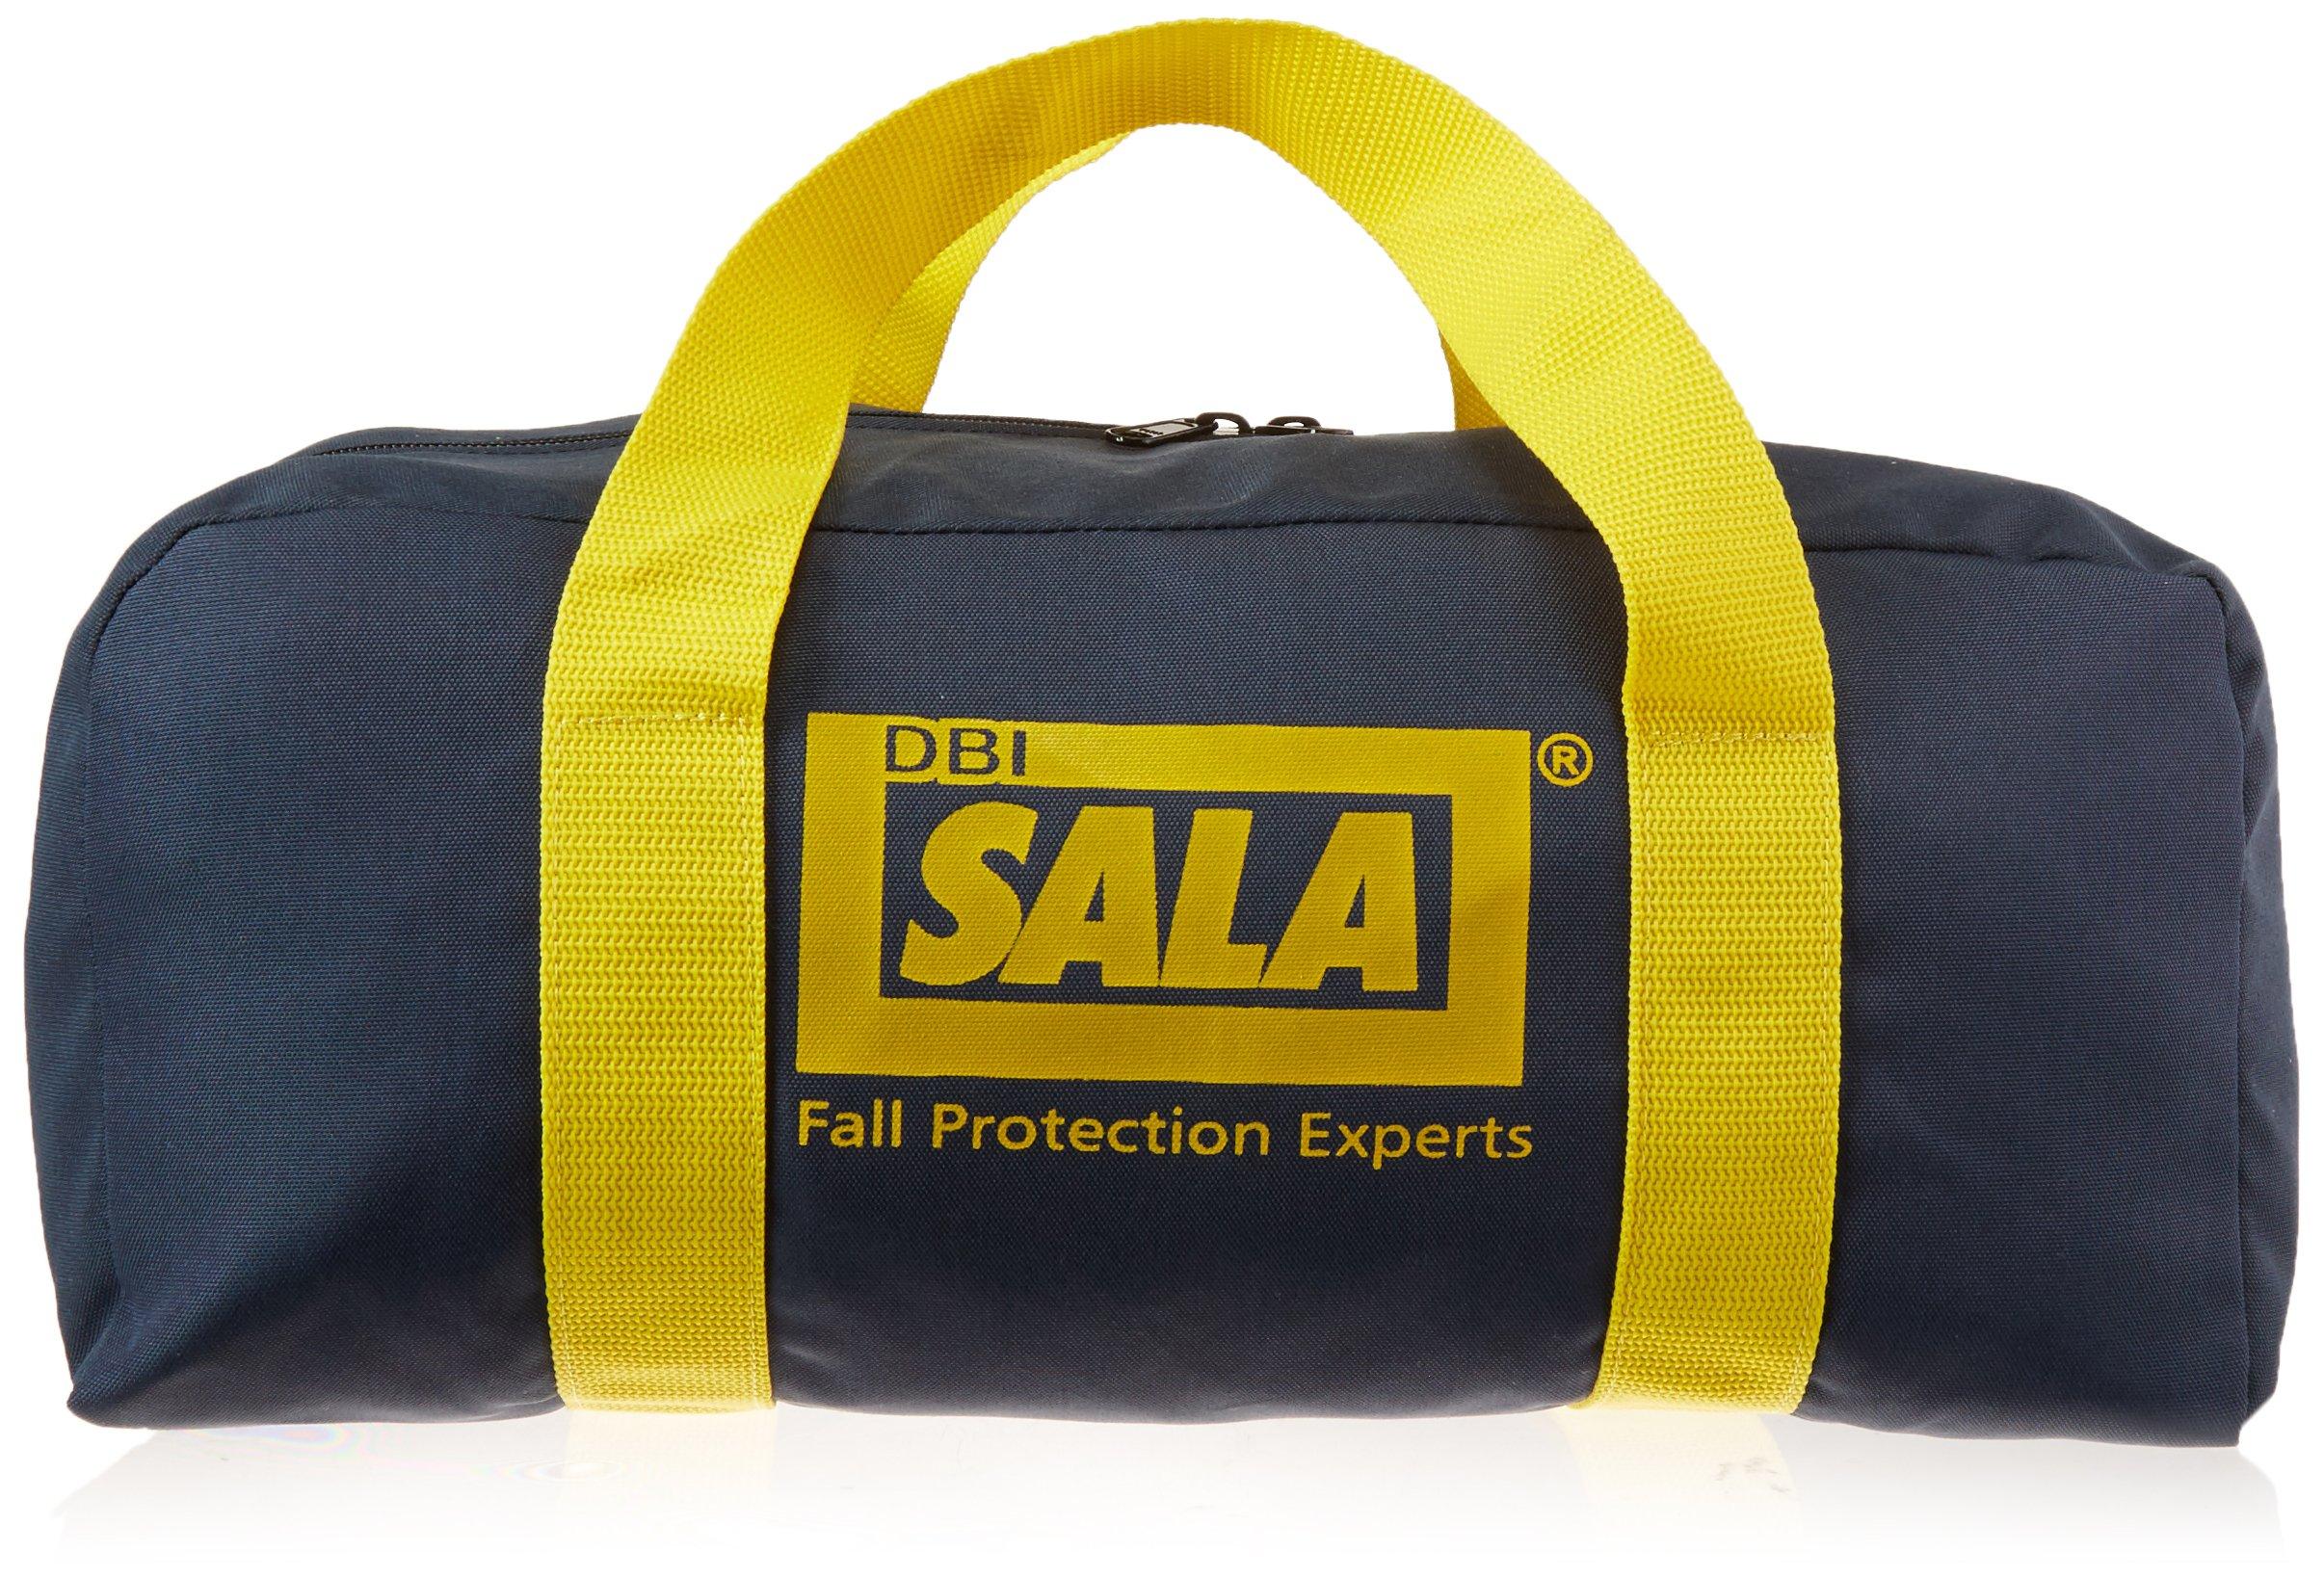 Capital Safety 9511597 SALA Bag Harness Accessory, 7-1/2 x 6-1/2 x 15-1/2-Inch